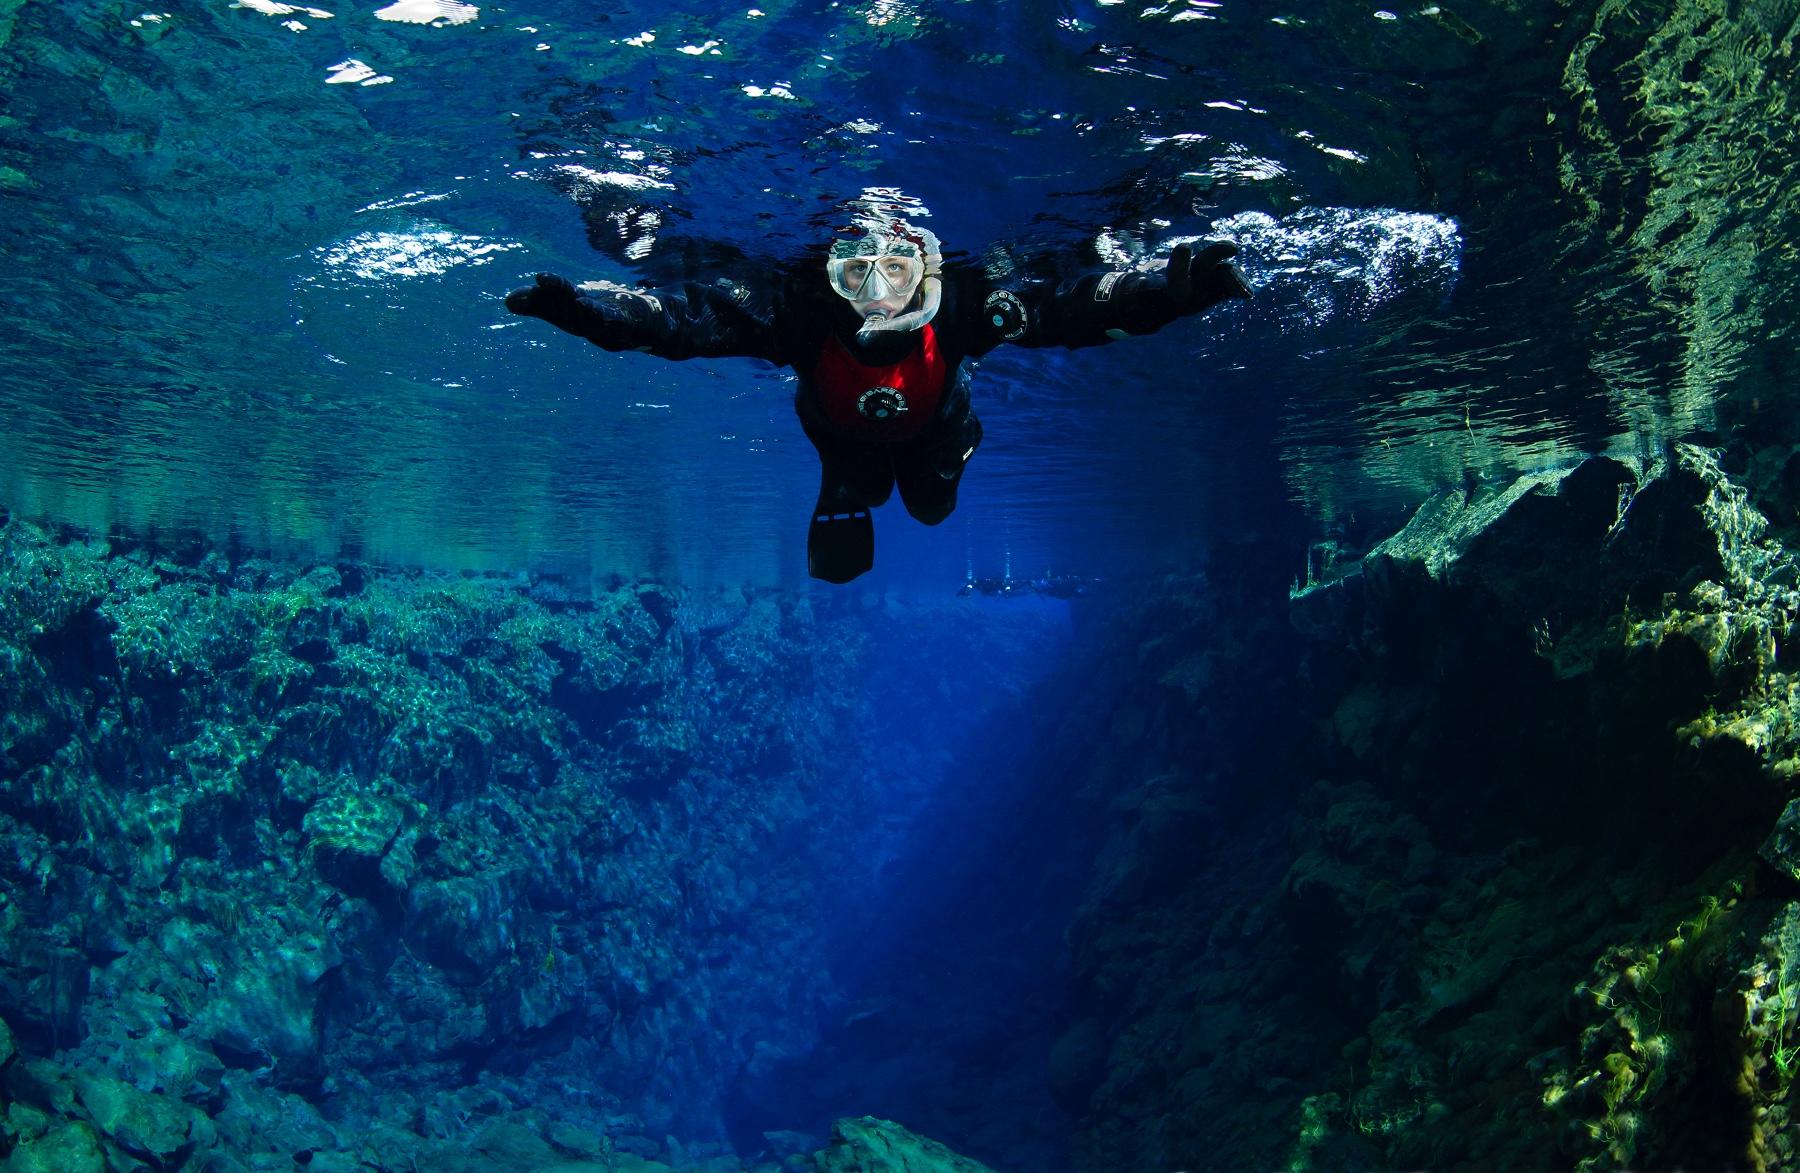 snorkeler-silfra-iceland-visibility-tobias-friedrich.jpg